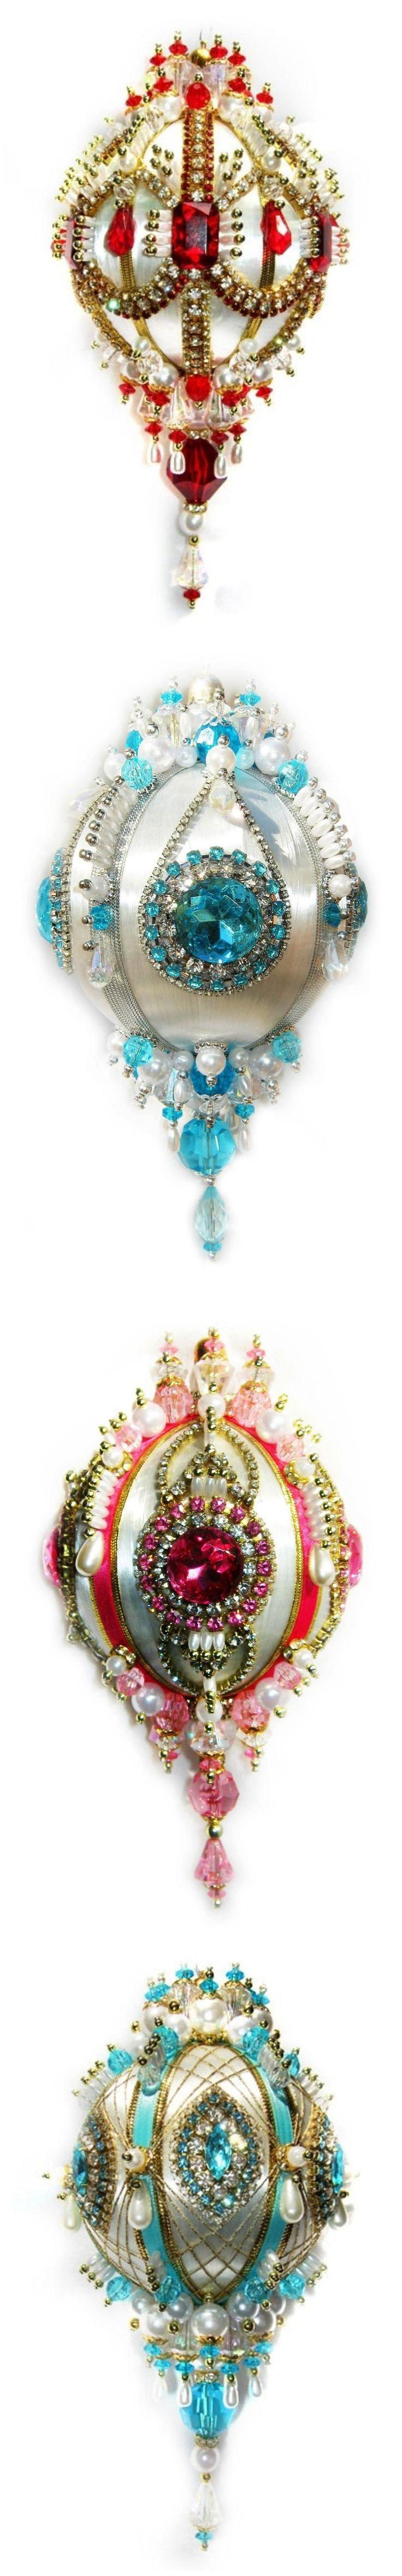 Prett satin Christmas ornaments with beads, sequines, rhinestones, ribbon trim etc. - julekugler - rigtig smukke